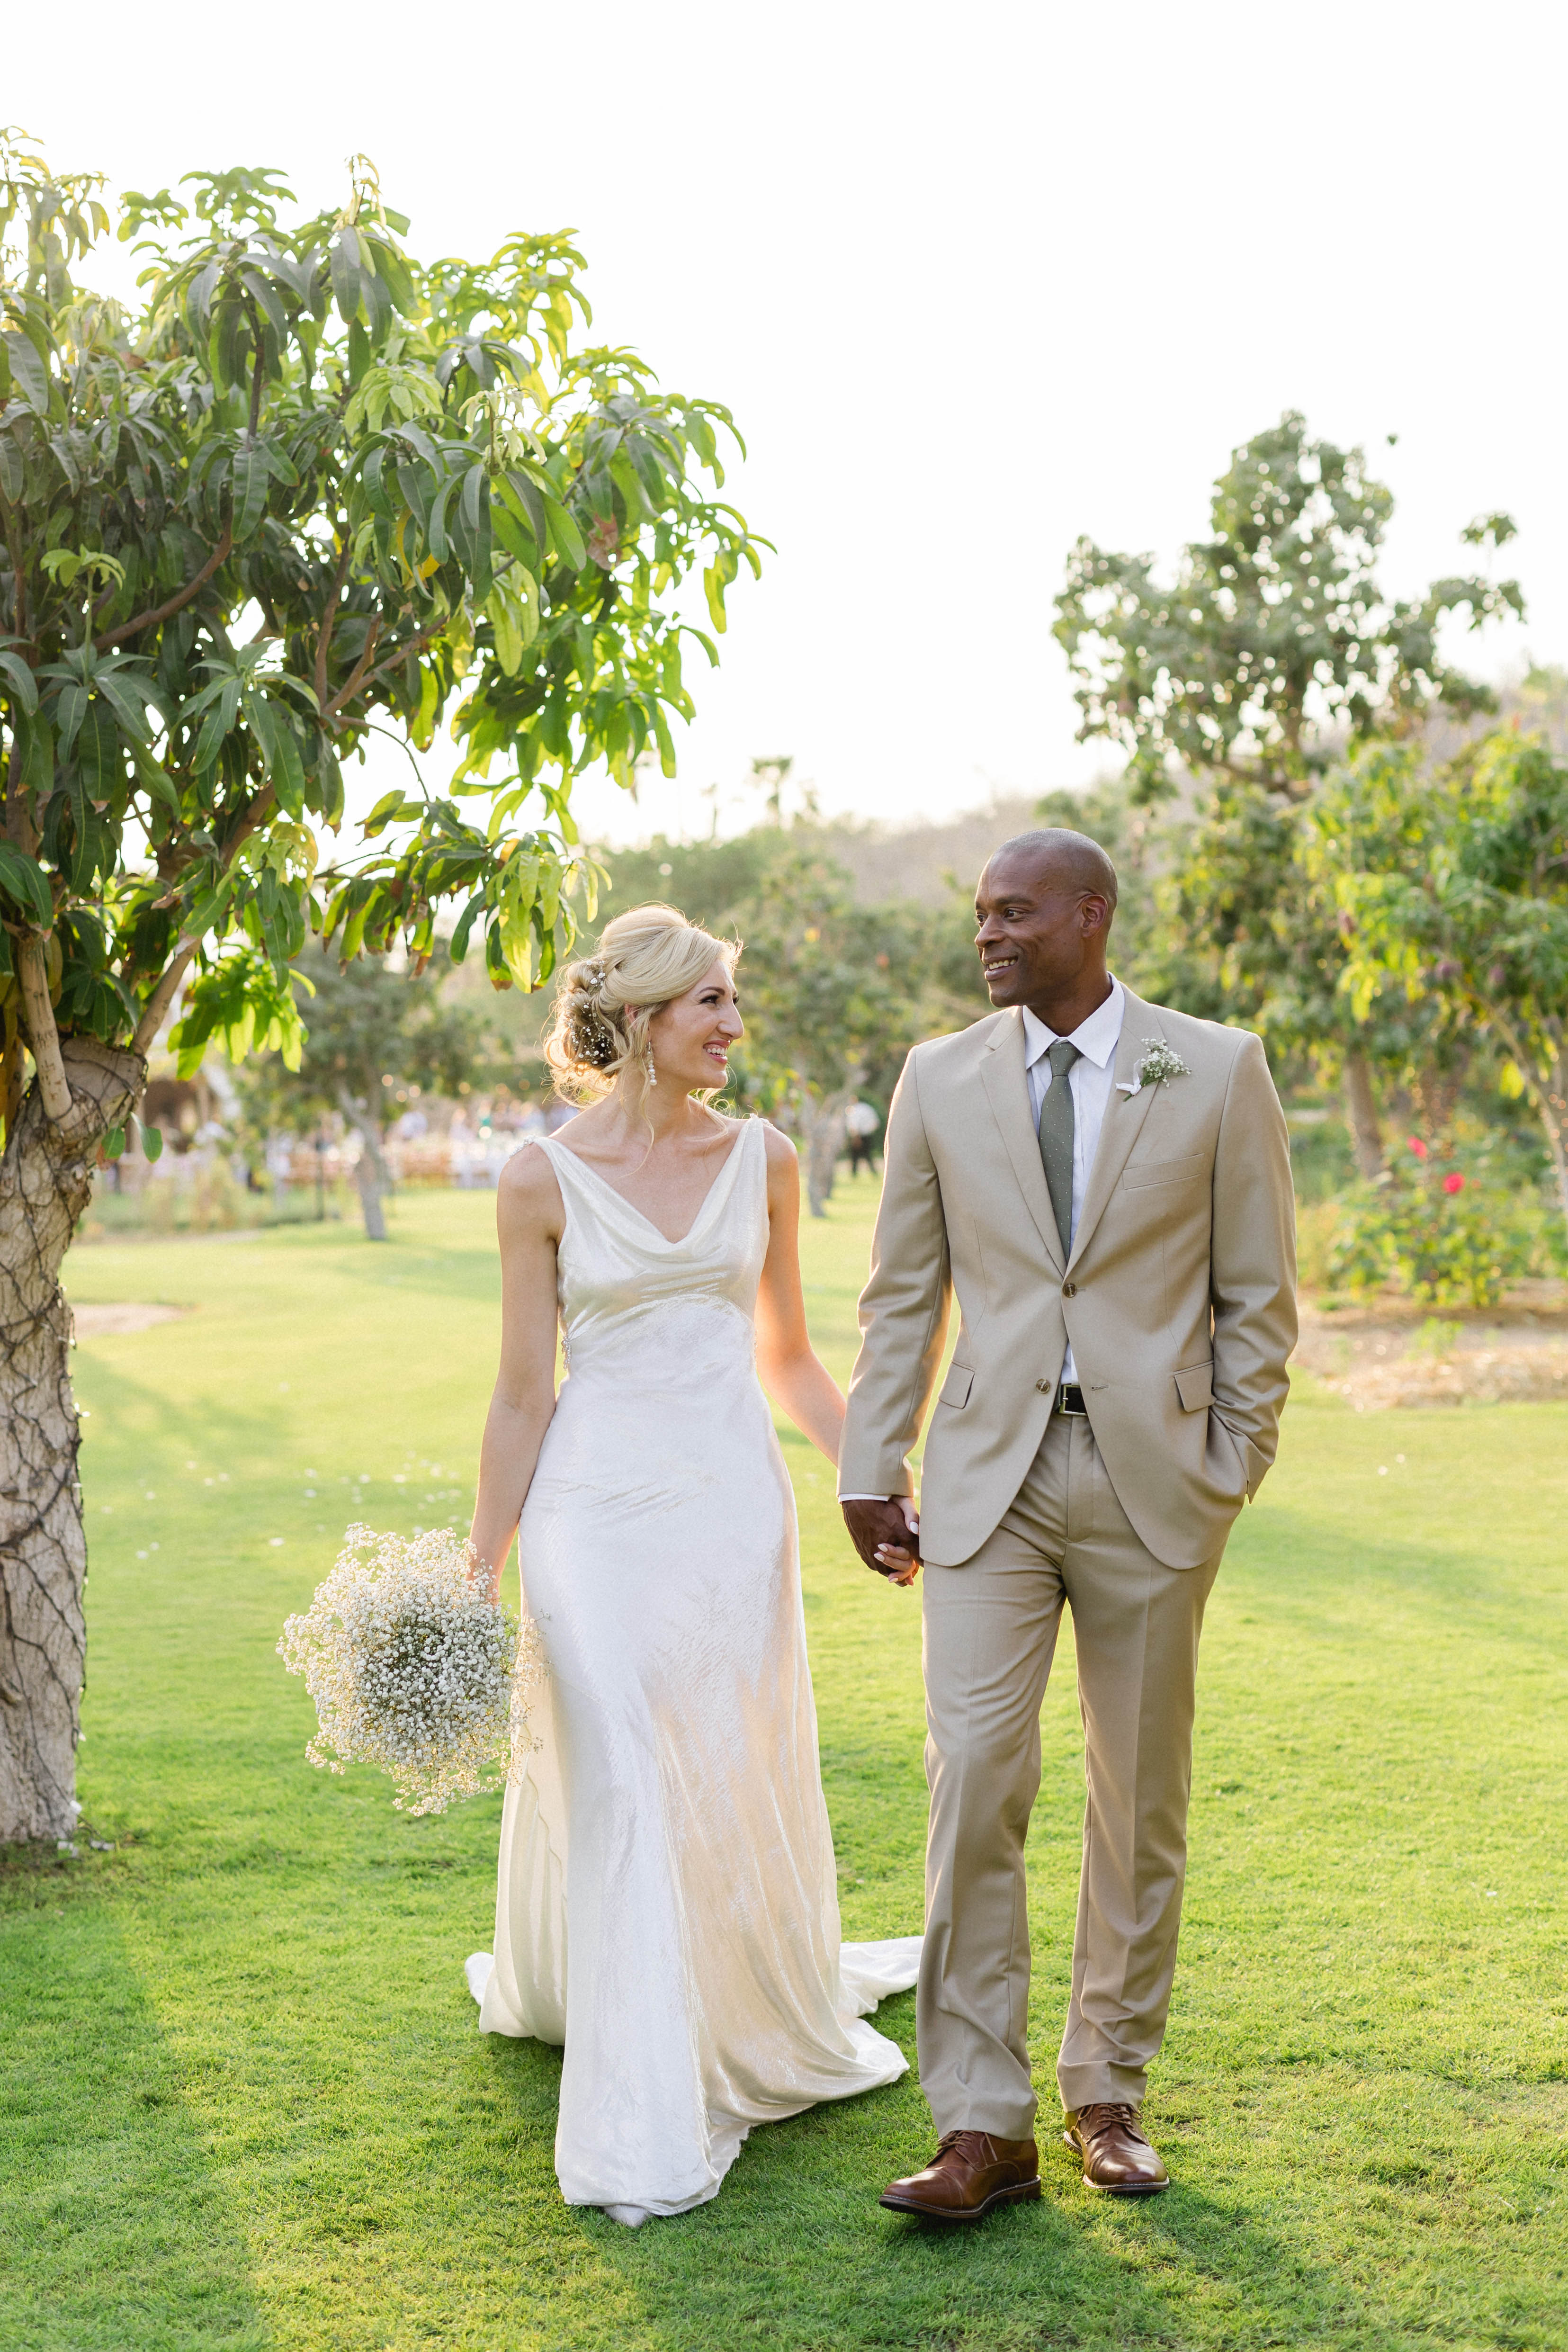 brittany craig wedding couple walking